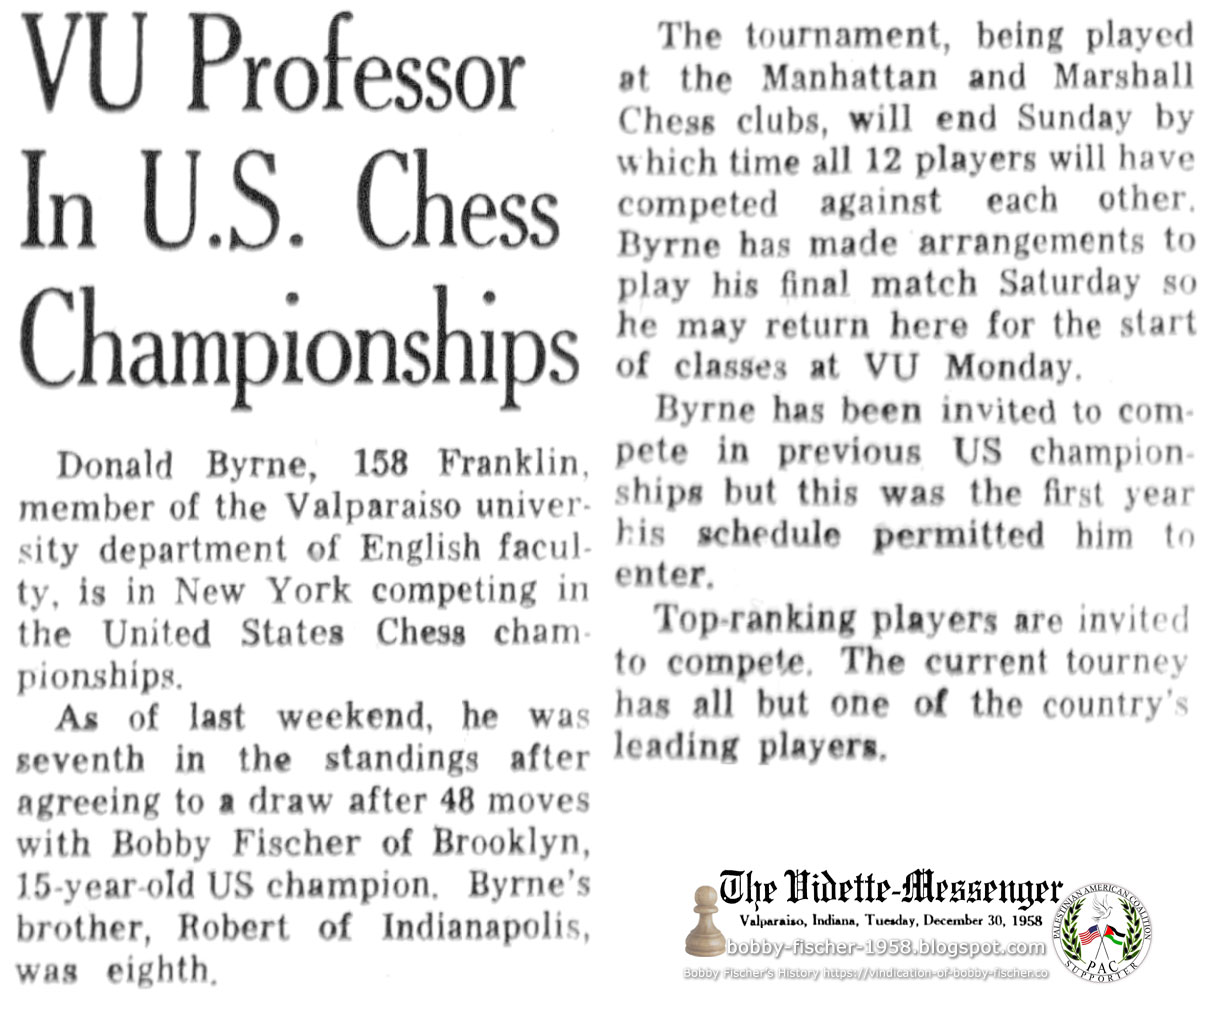 VU Professor In U.S. Chess Championships